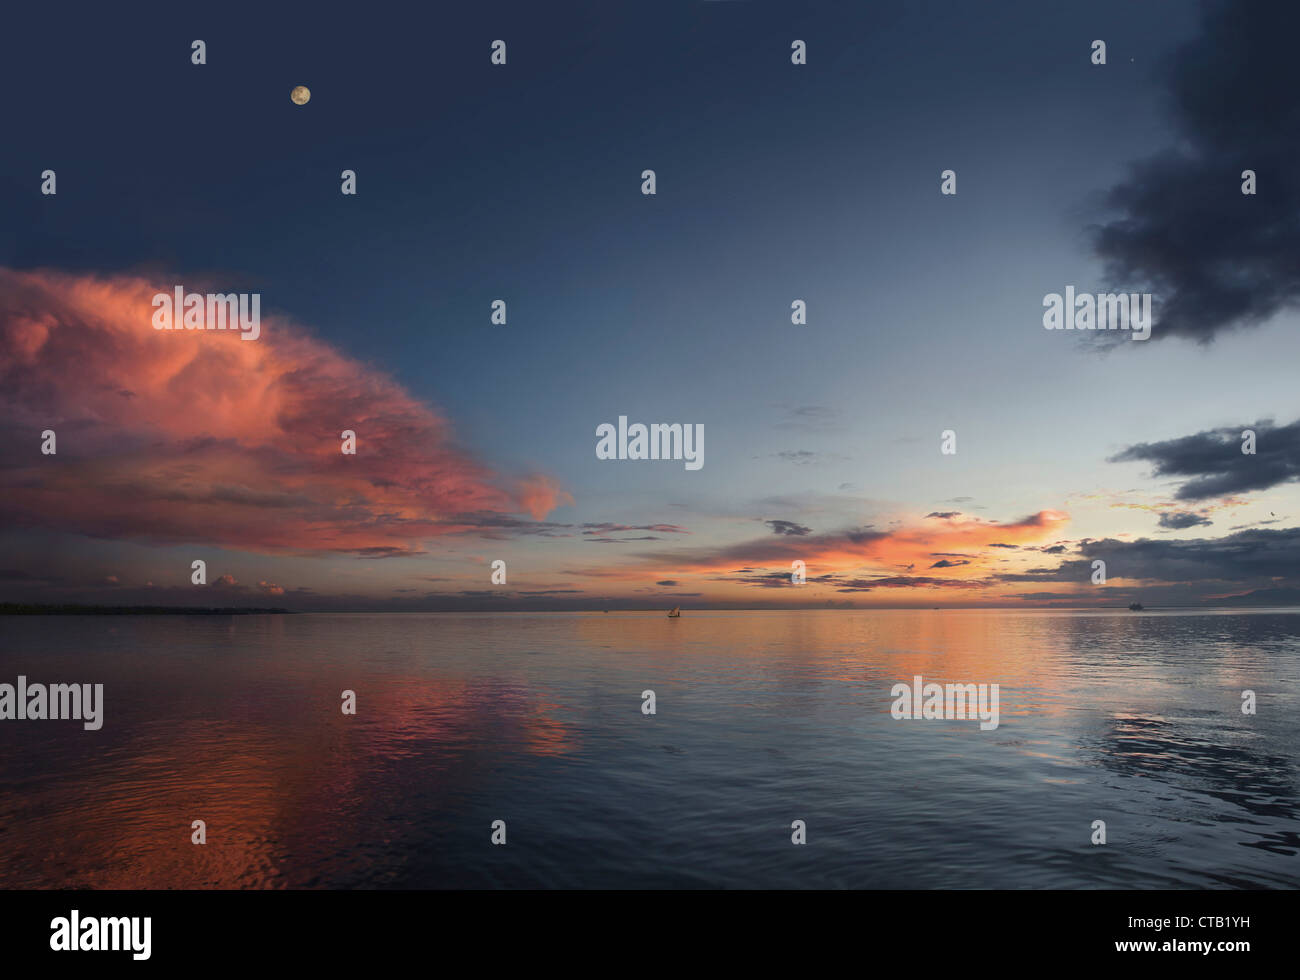 Rote Wolke über dem Amazonas bei Sonnenuntergang, Amazonas, Amazonas, Brasilien Stockbild